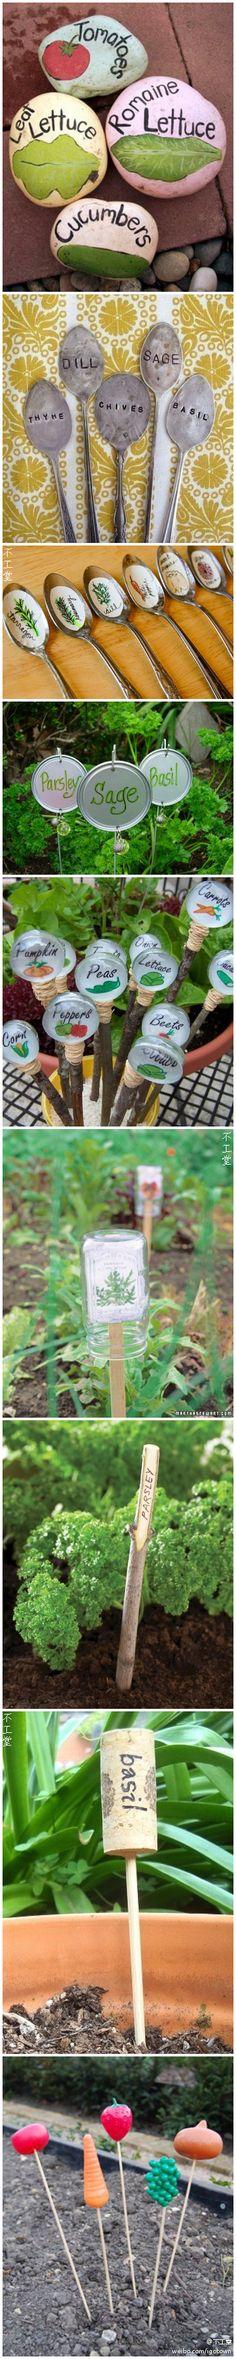 Cute garden markers.